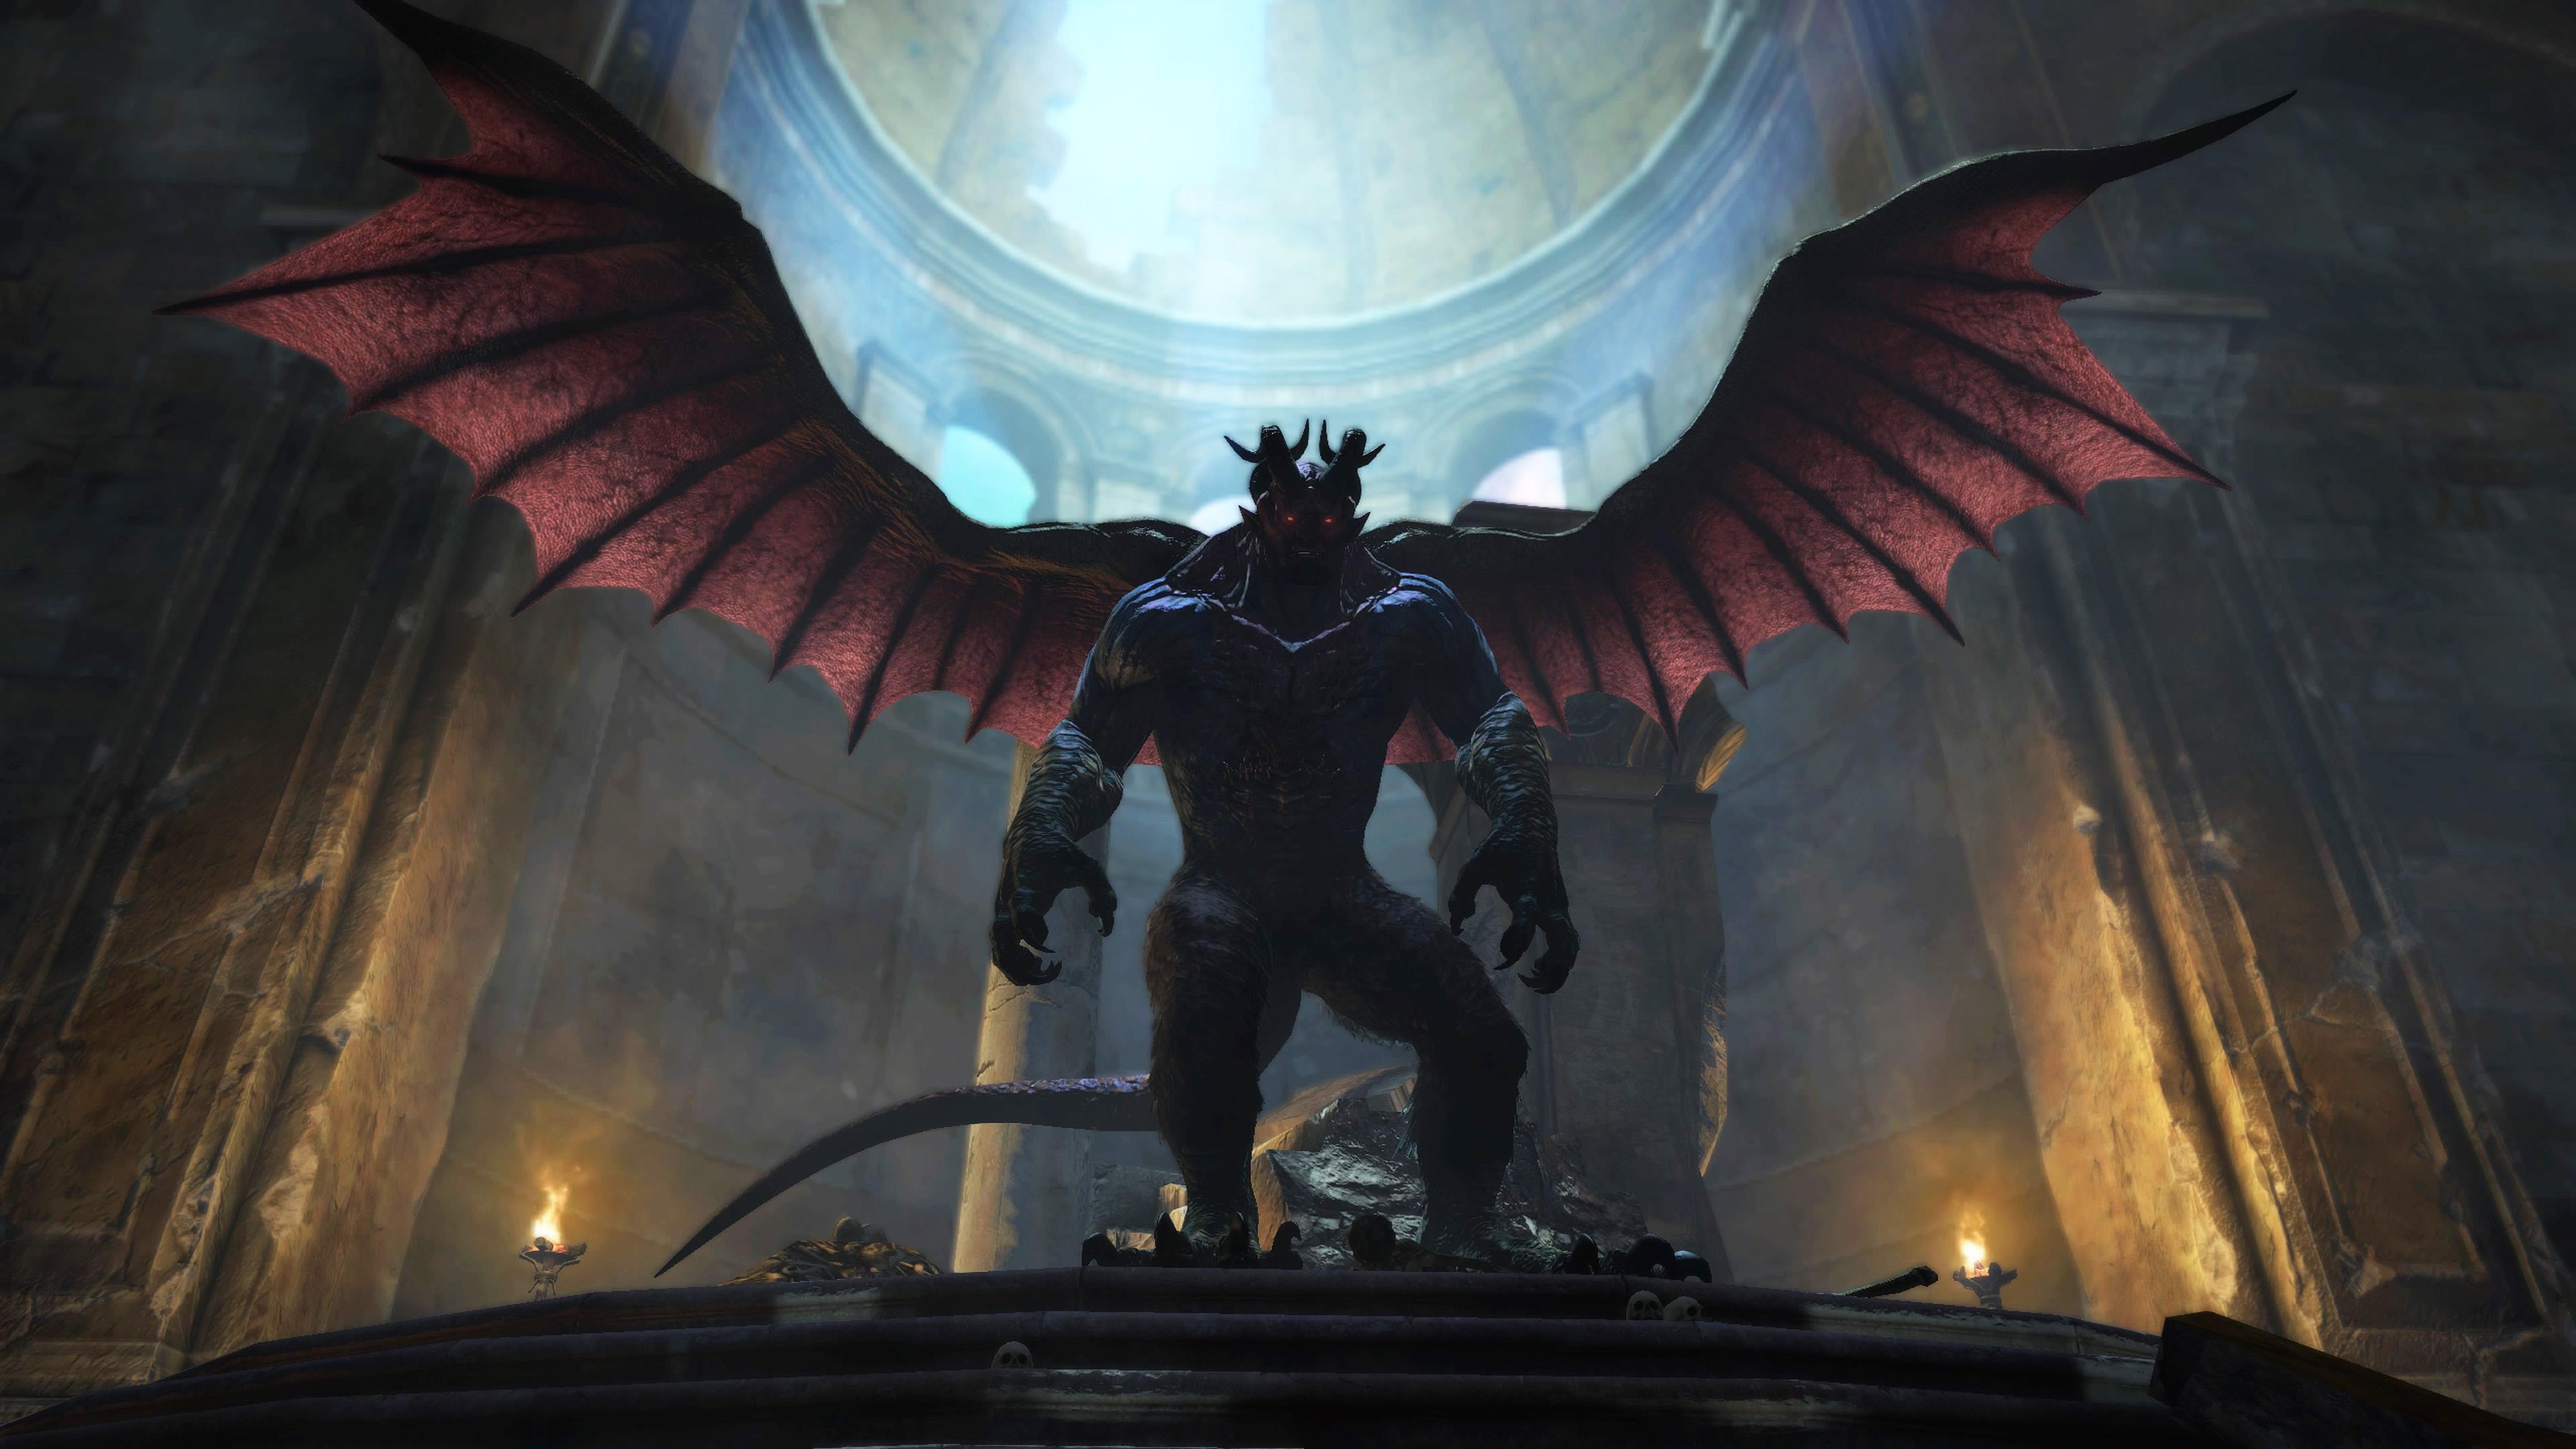 3. října vyjde Dragon's Dogma: Dark Arisen pro PS4 a Xbox One 148236